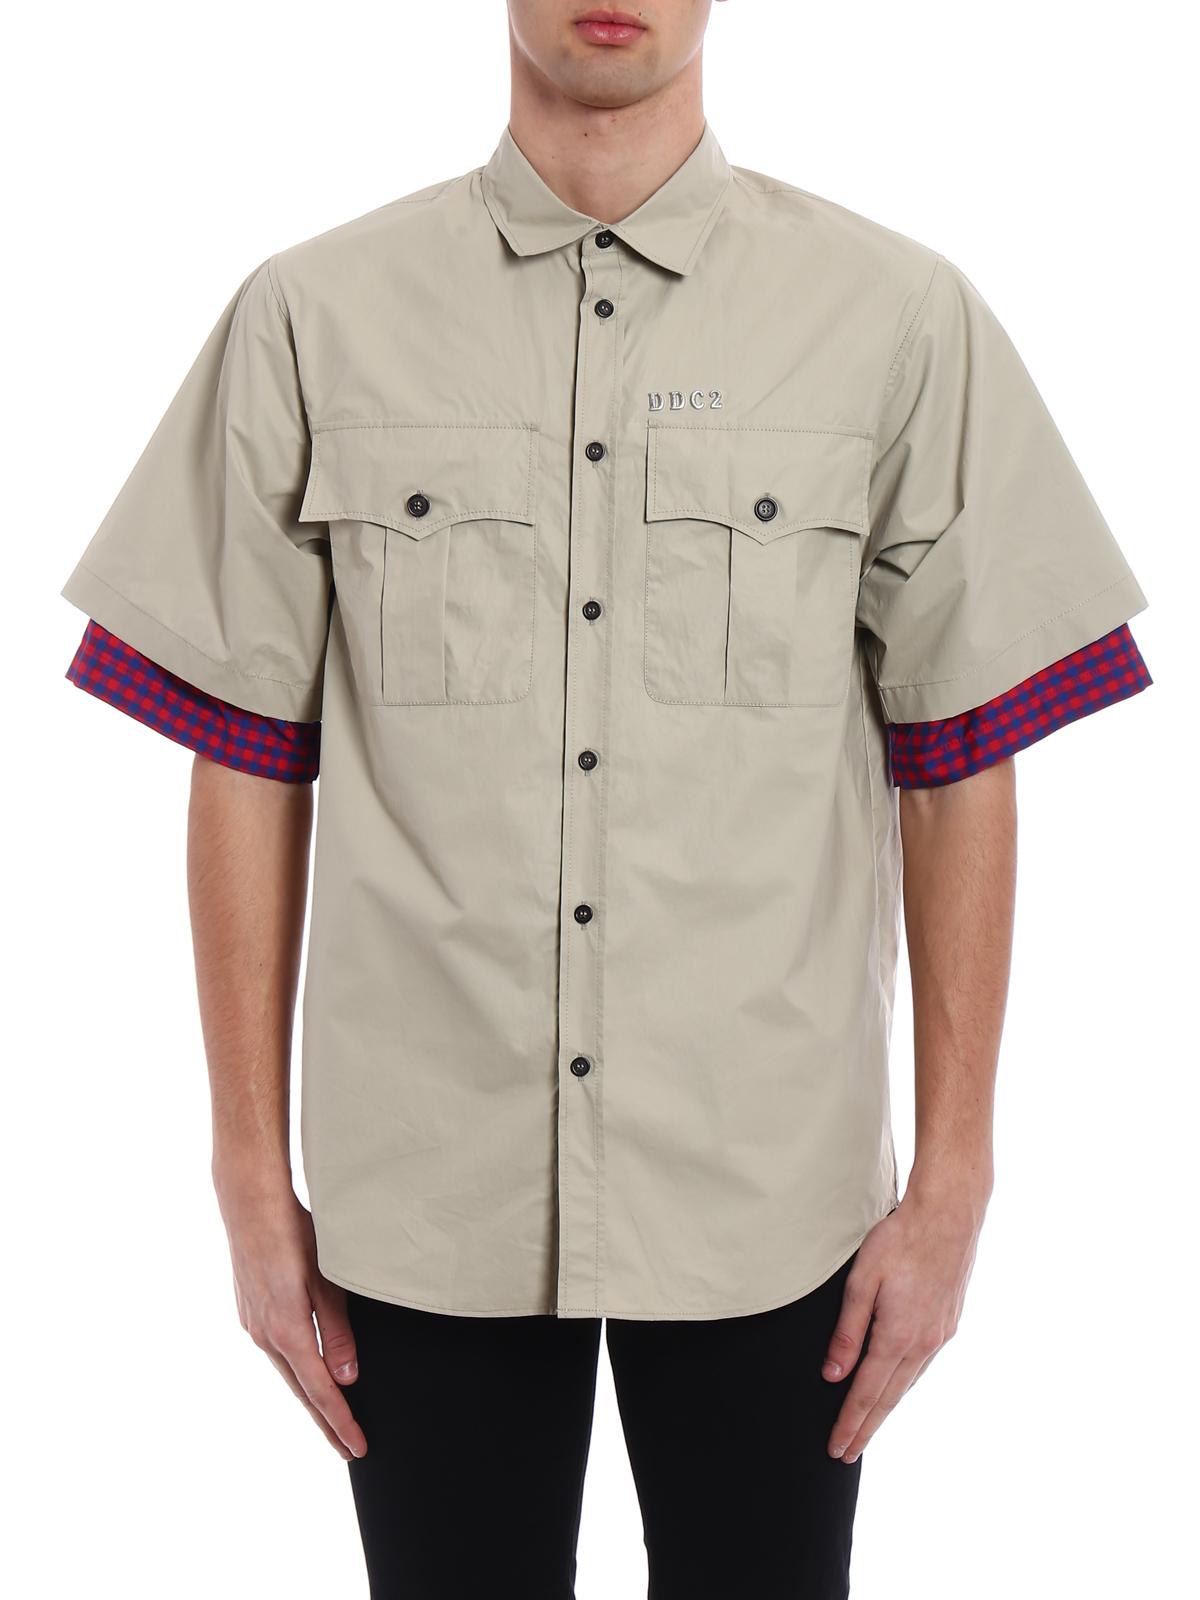 d7c1a5f4162f4 Dsquared2 - Coated cotton shirt - shirts - S71DM0140S48393800 ...